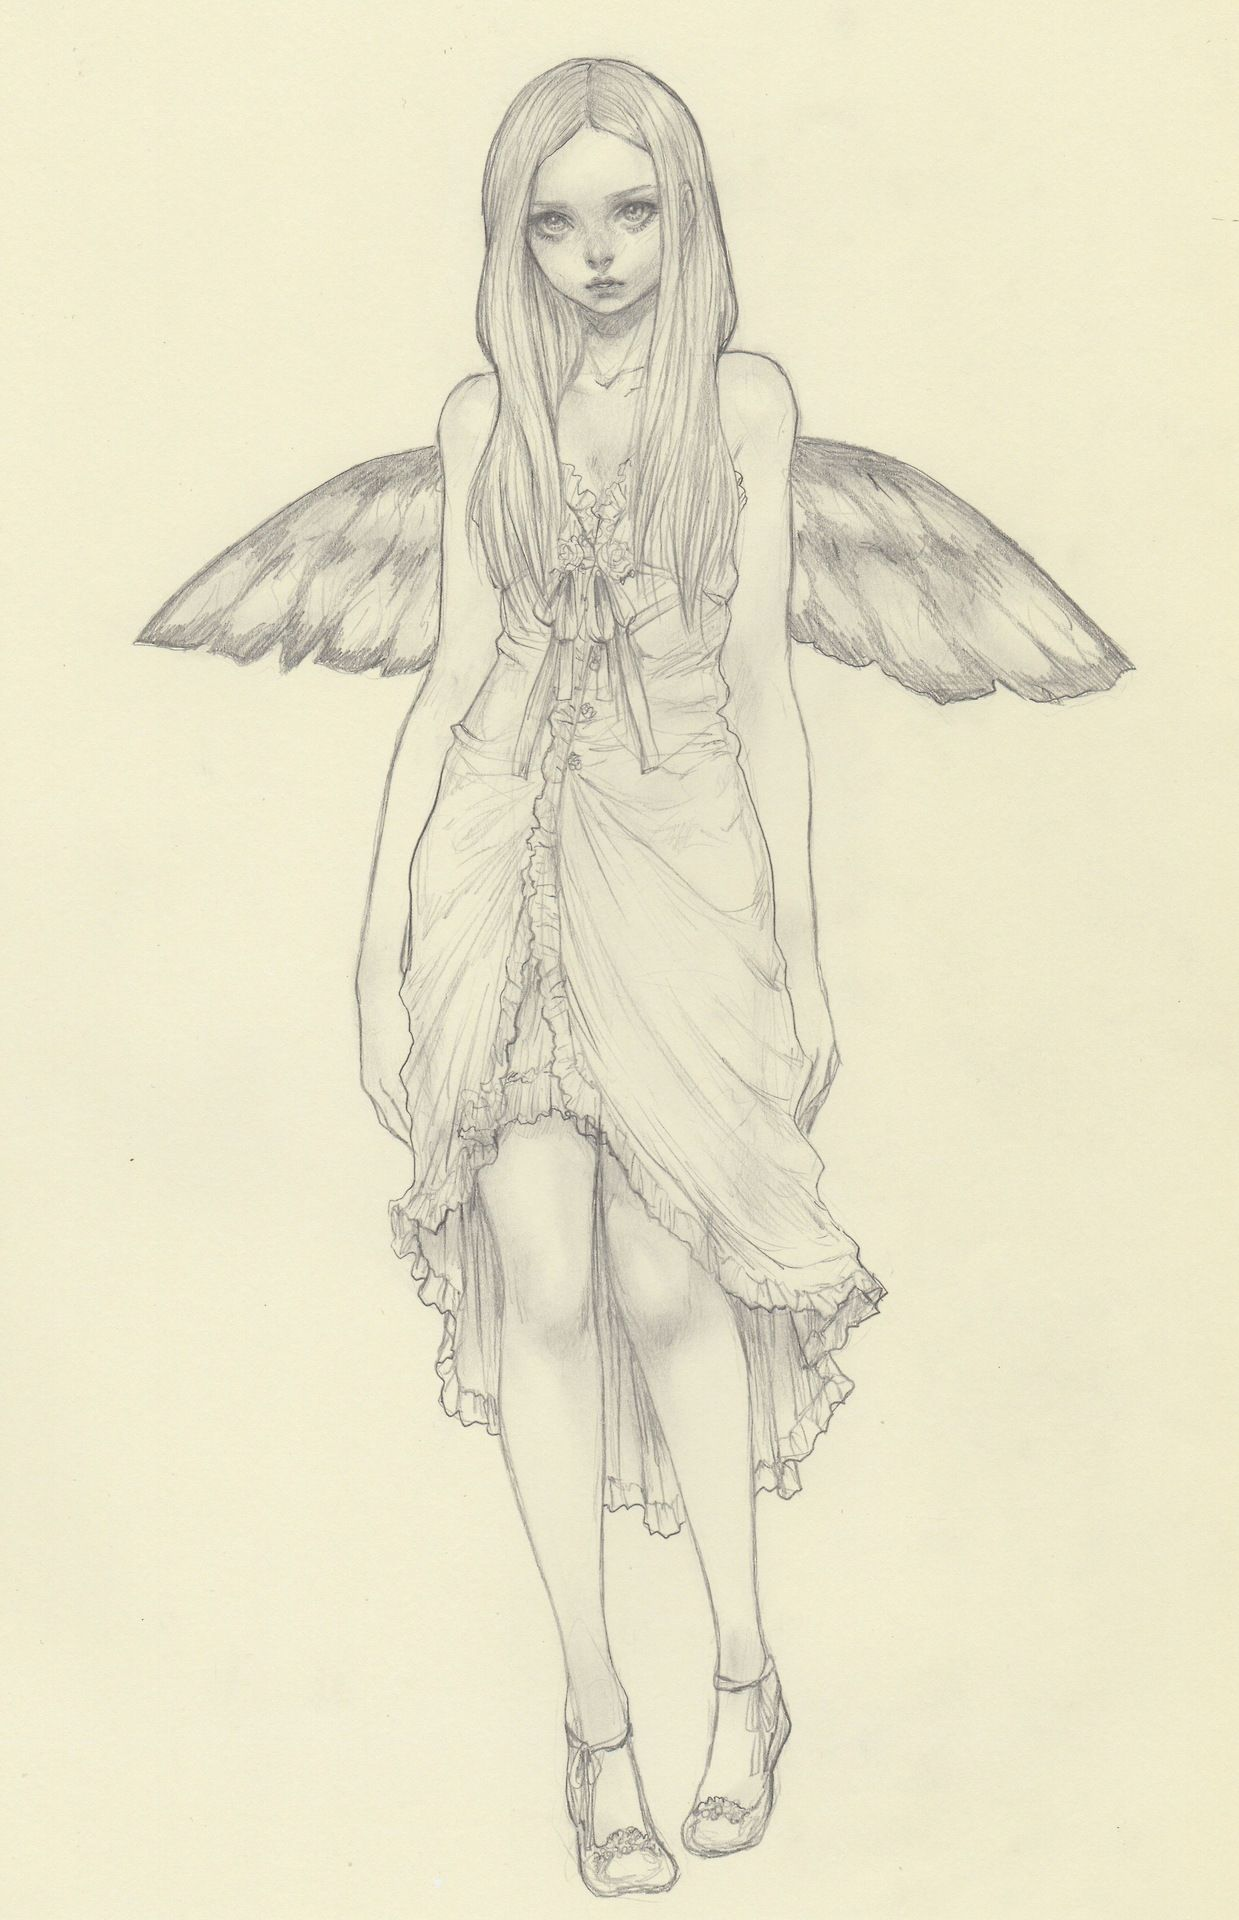 Jasmin Darnell Yasahime Dibujo Personajes Dibujos Ilustraciones